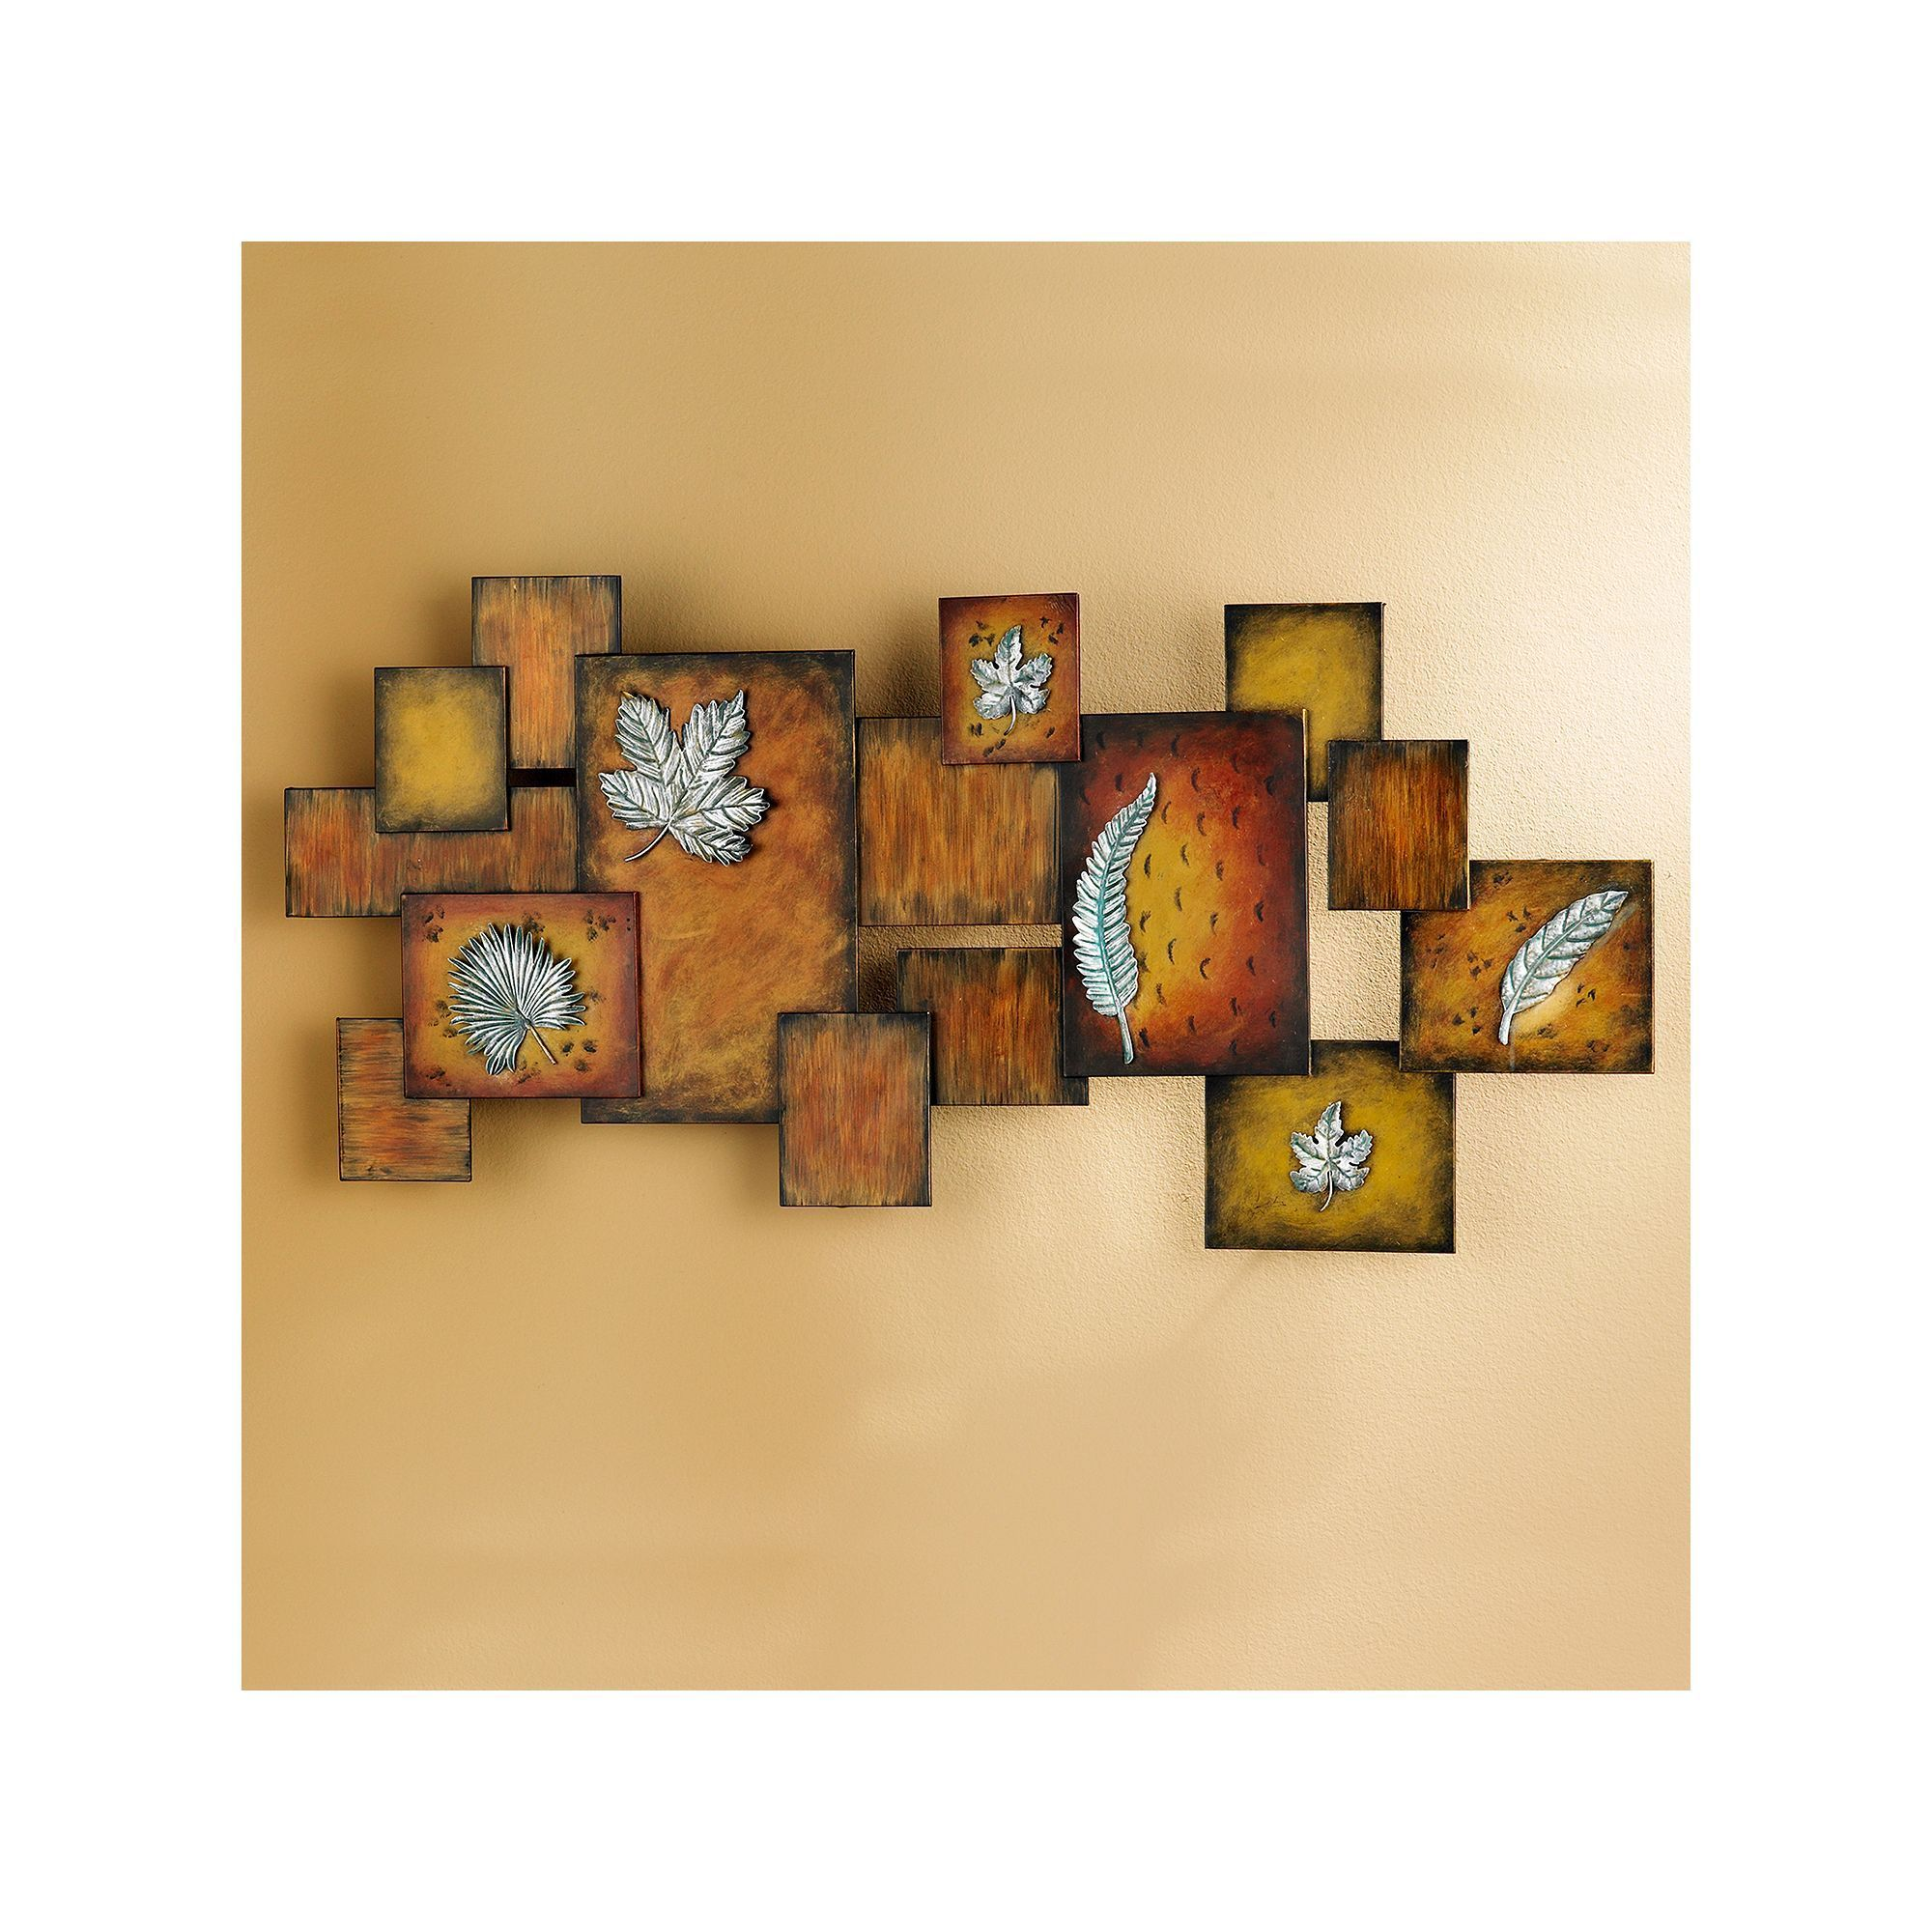 Lincoln Embossed Leaf Metal Wall Decor Panel, Orange | Metal walls ...